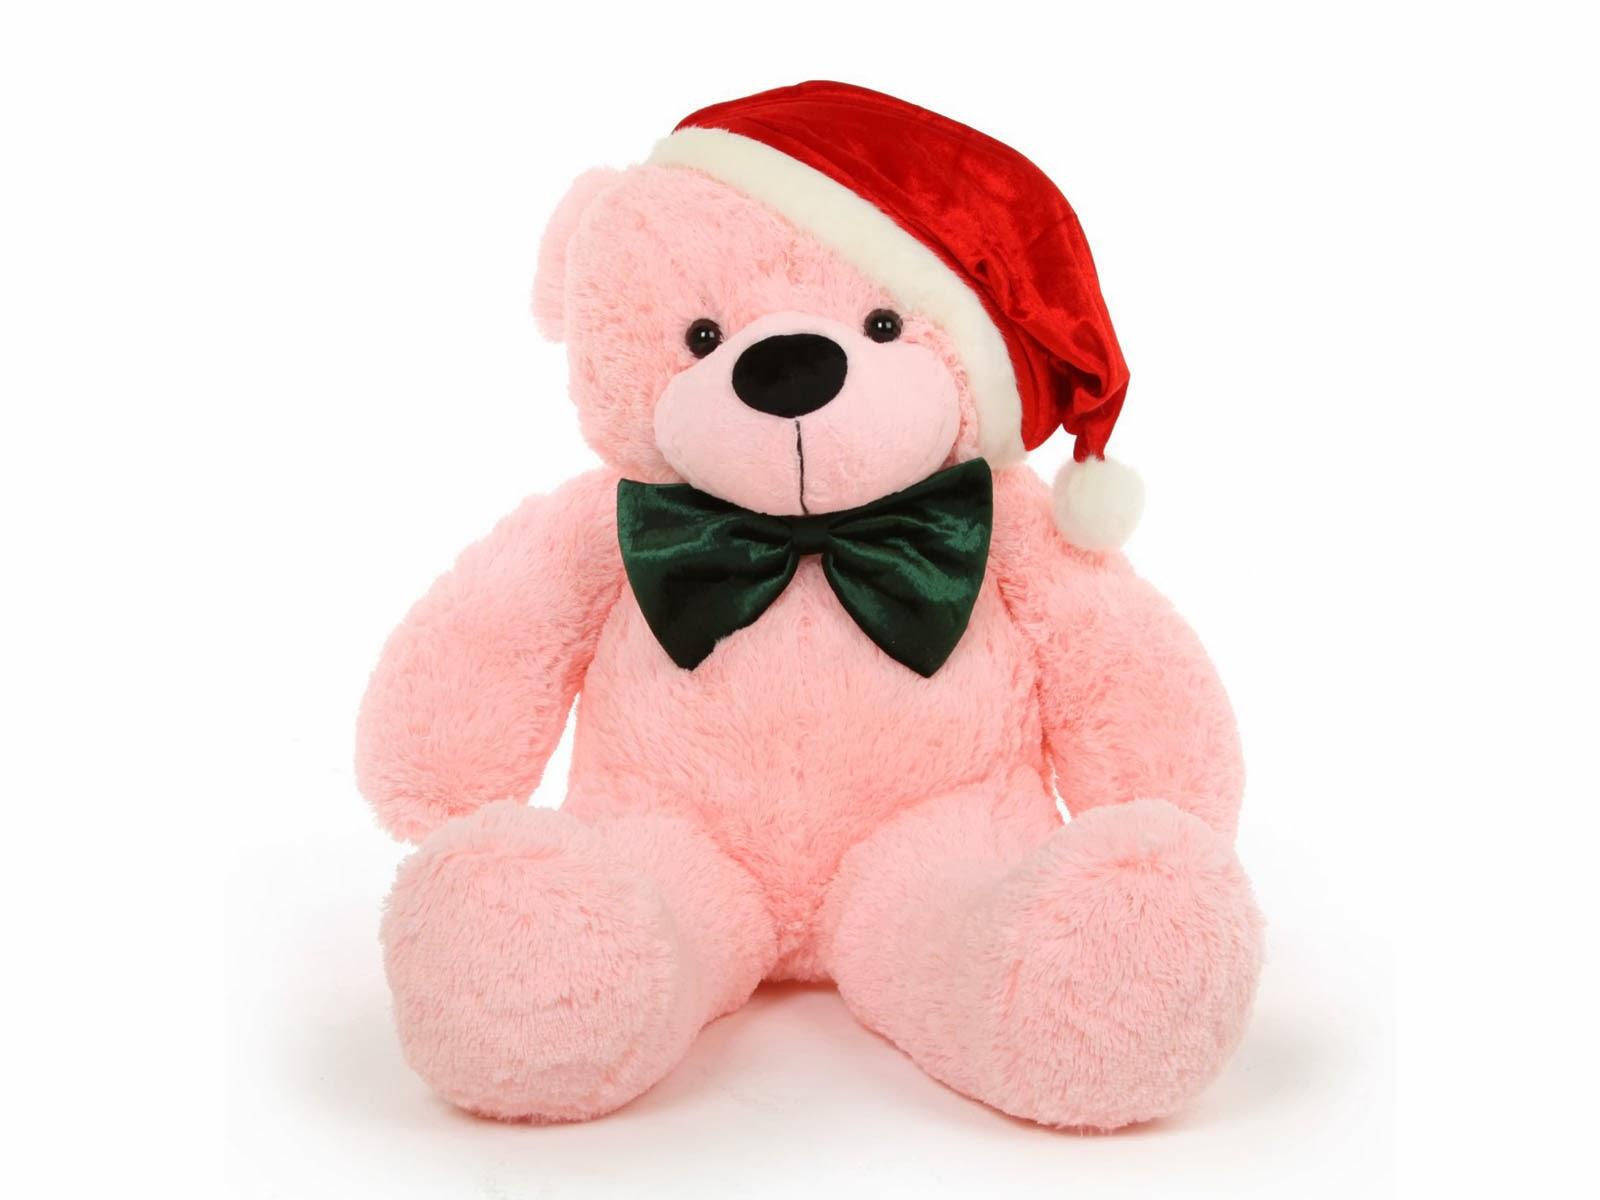 Download teddy bear cute user wallpaper full hd wallpapers 1600x1200 voltagebd Images